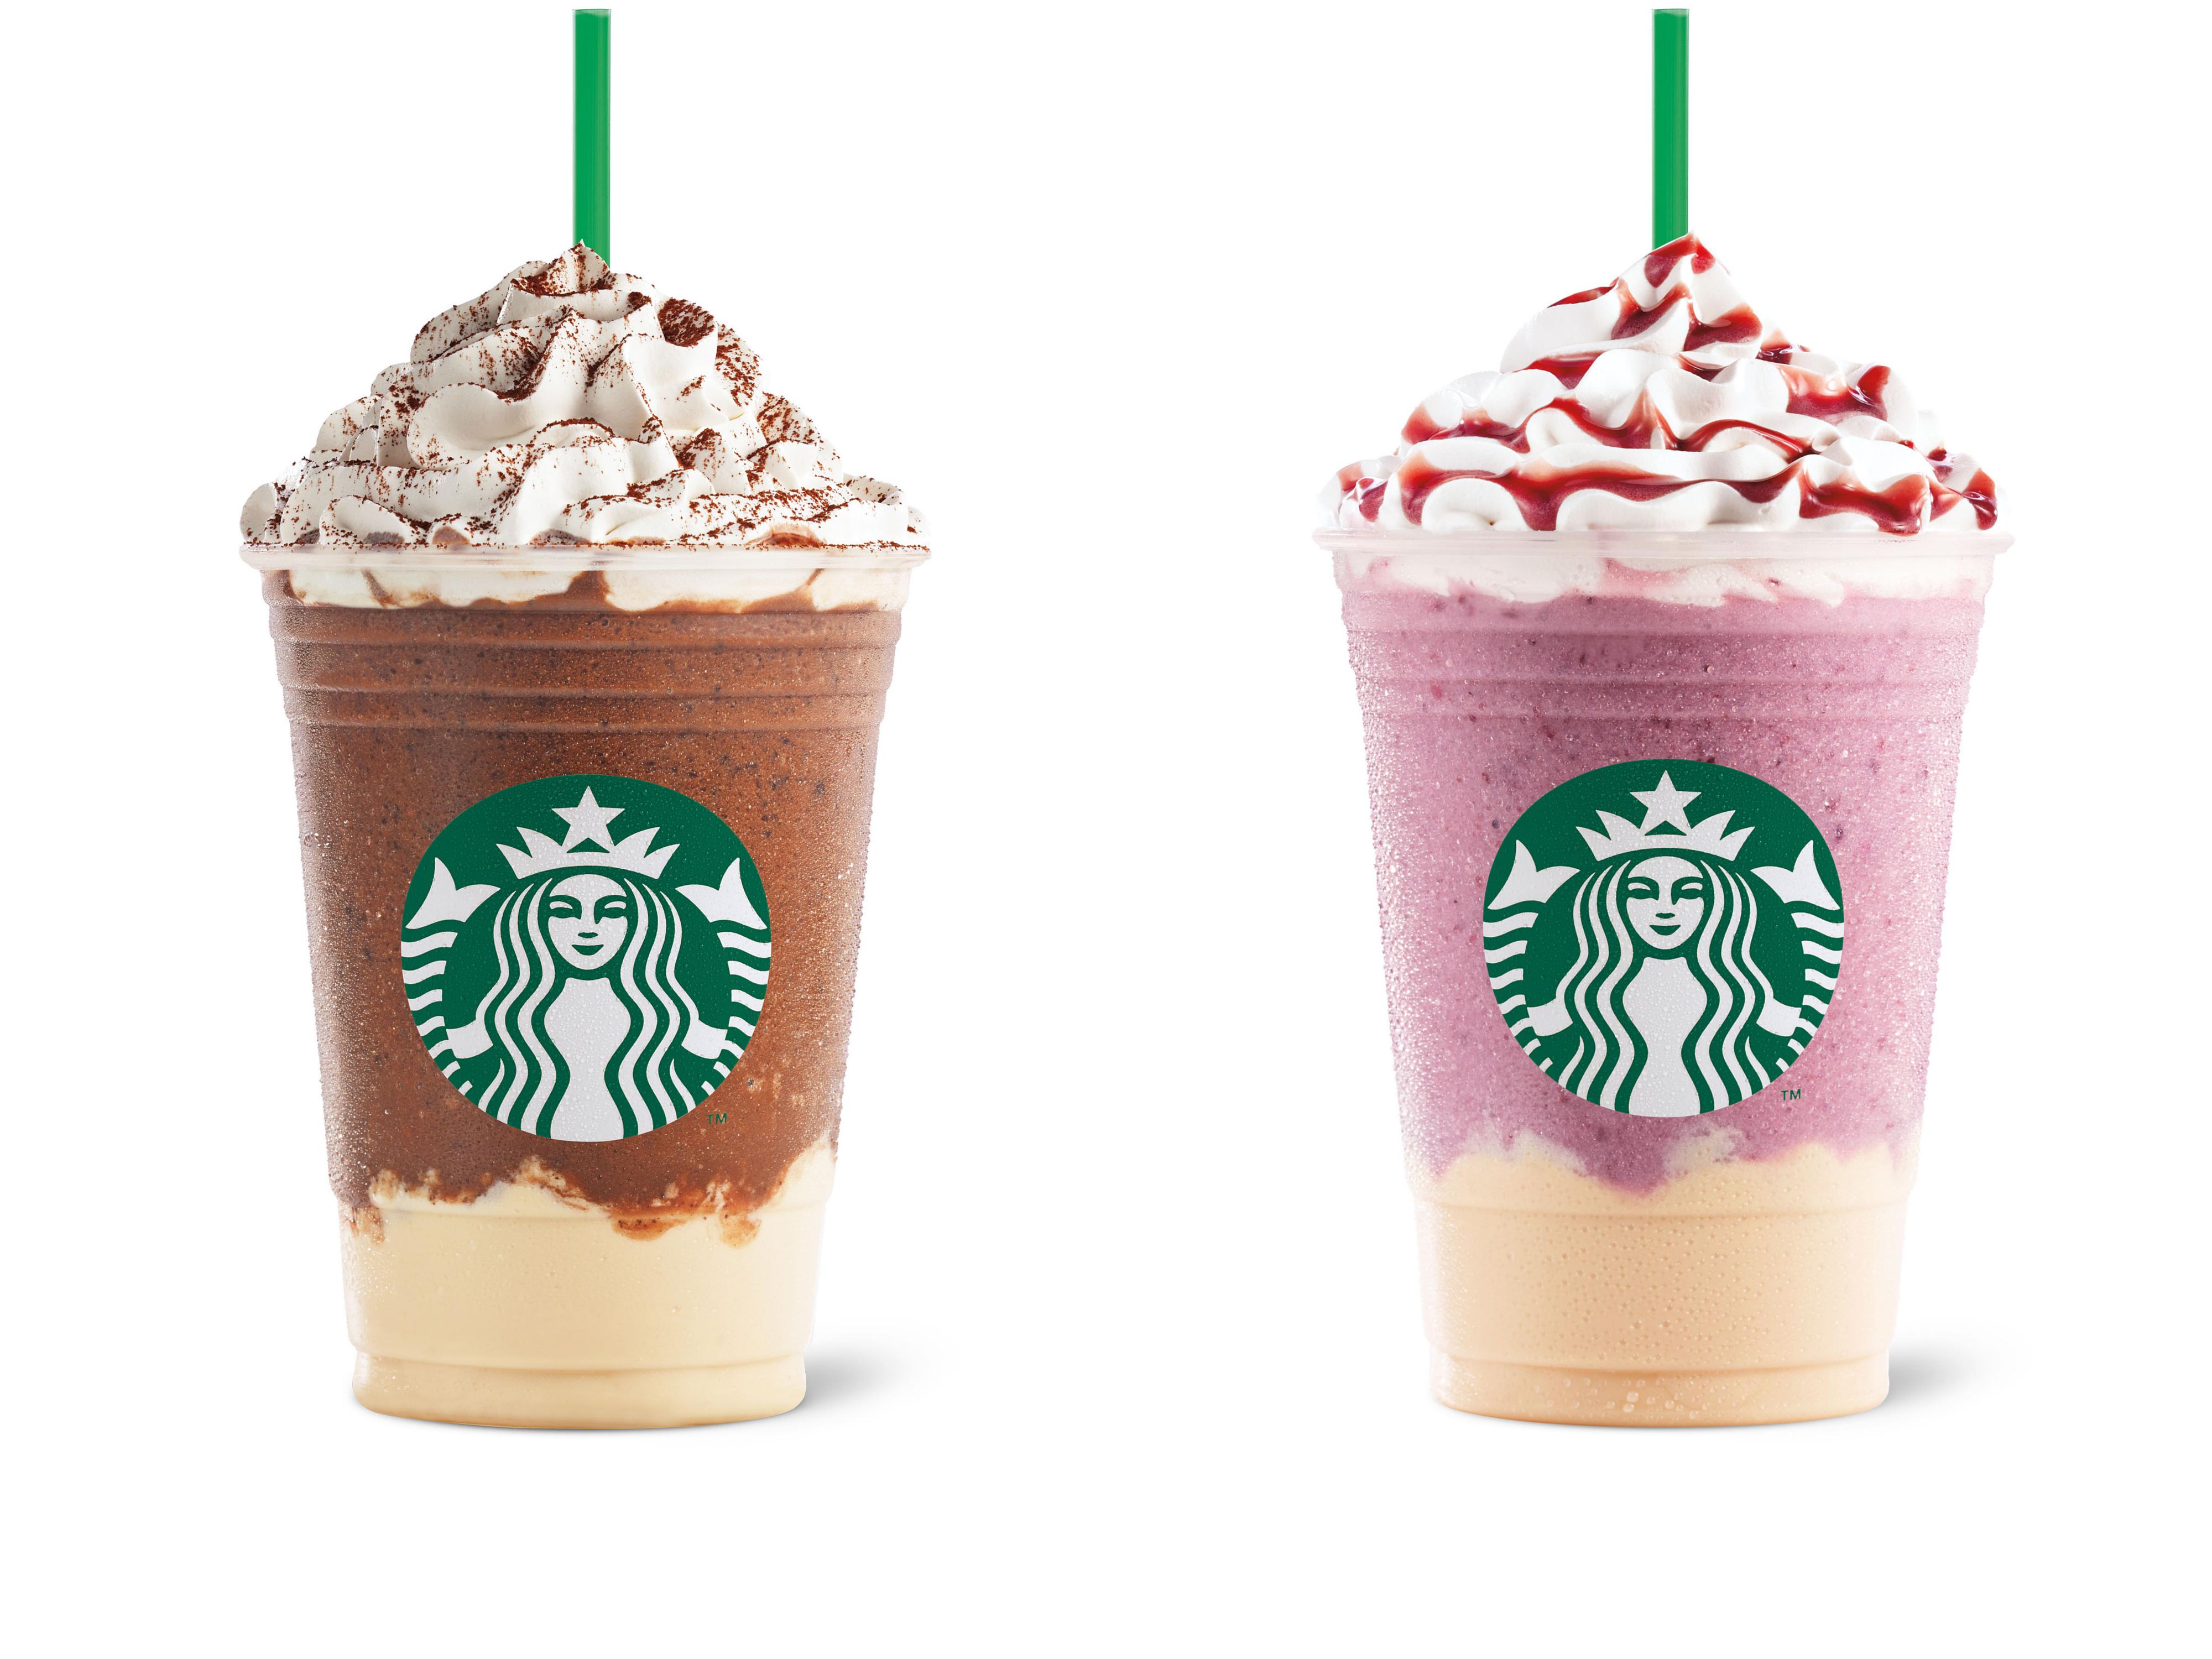 starbucks drinks Google Search Starbucks drinks